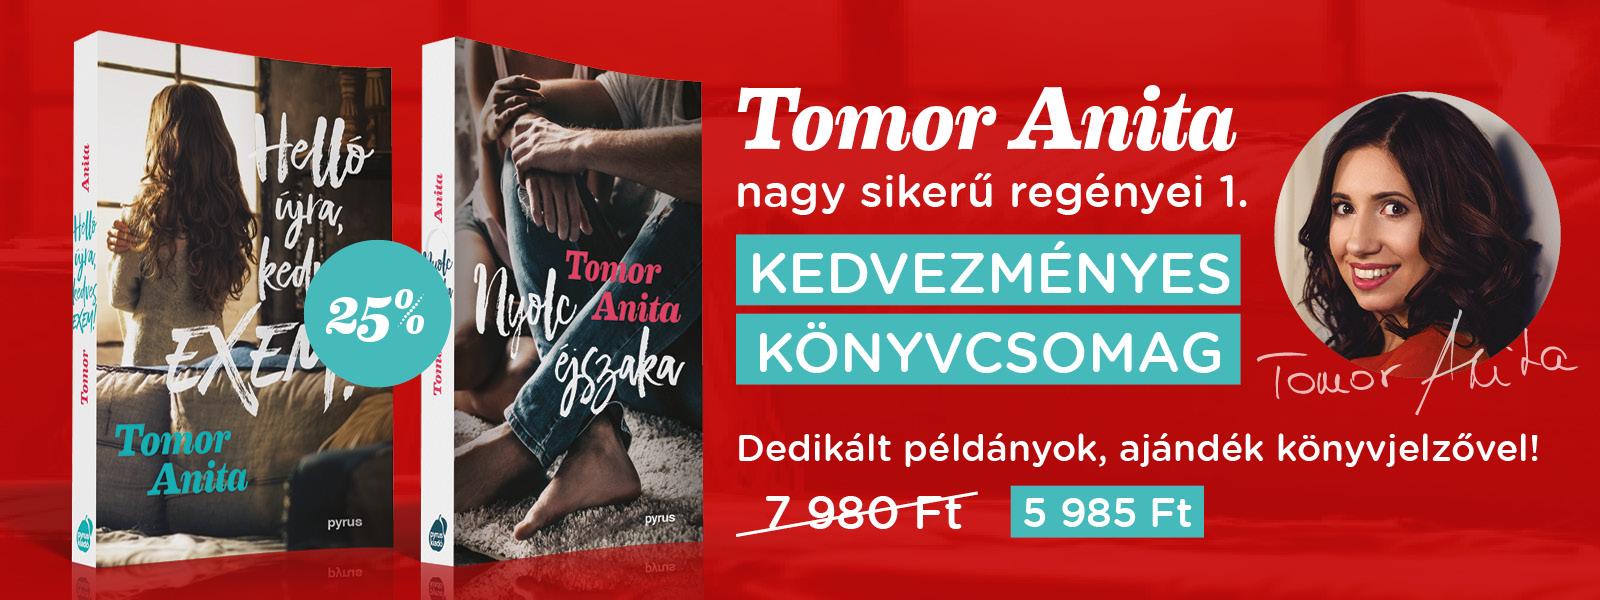 Tomor Anita könyvcsomag 1